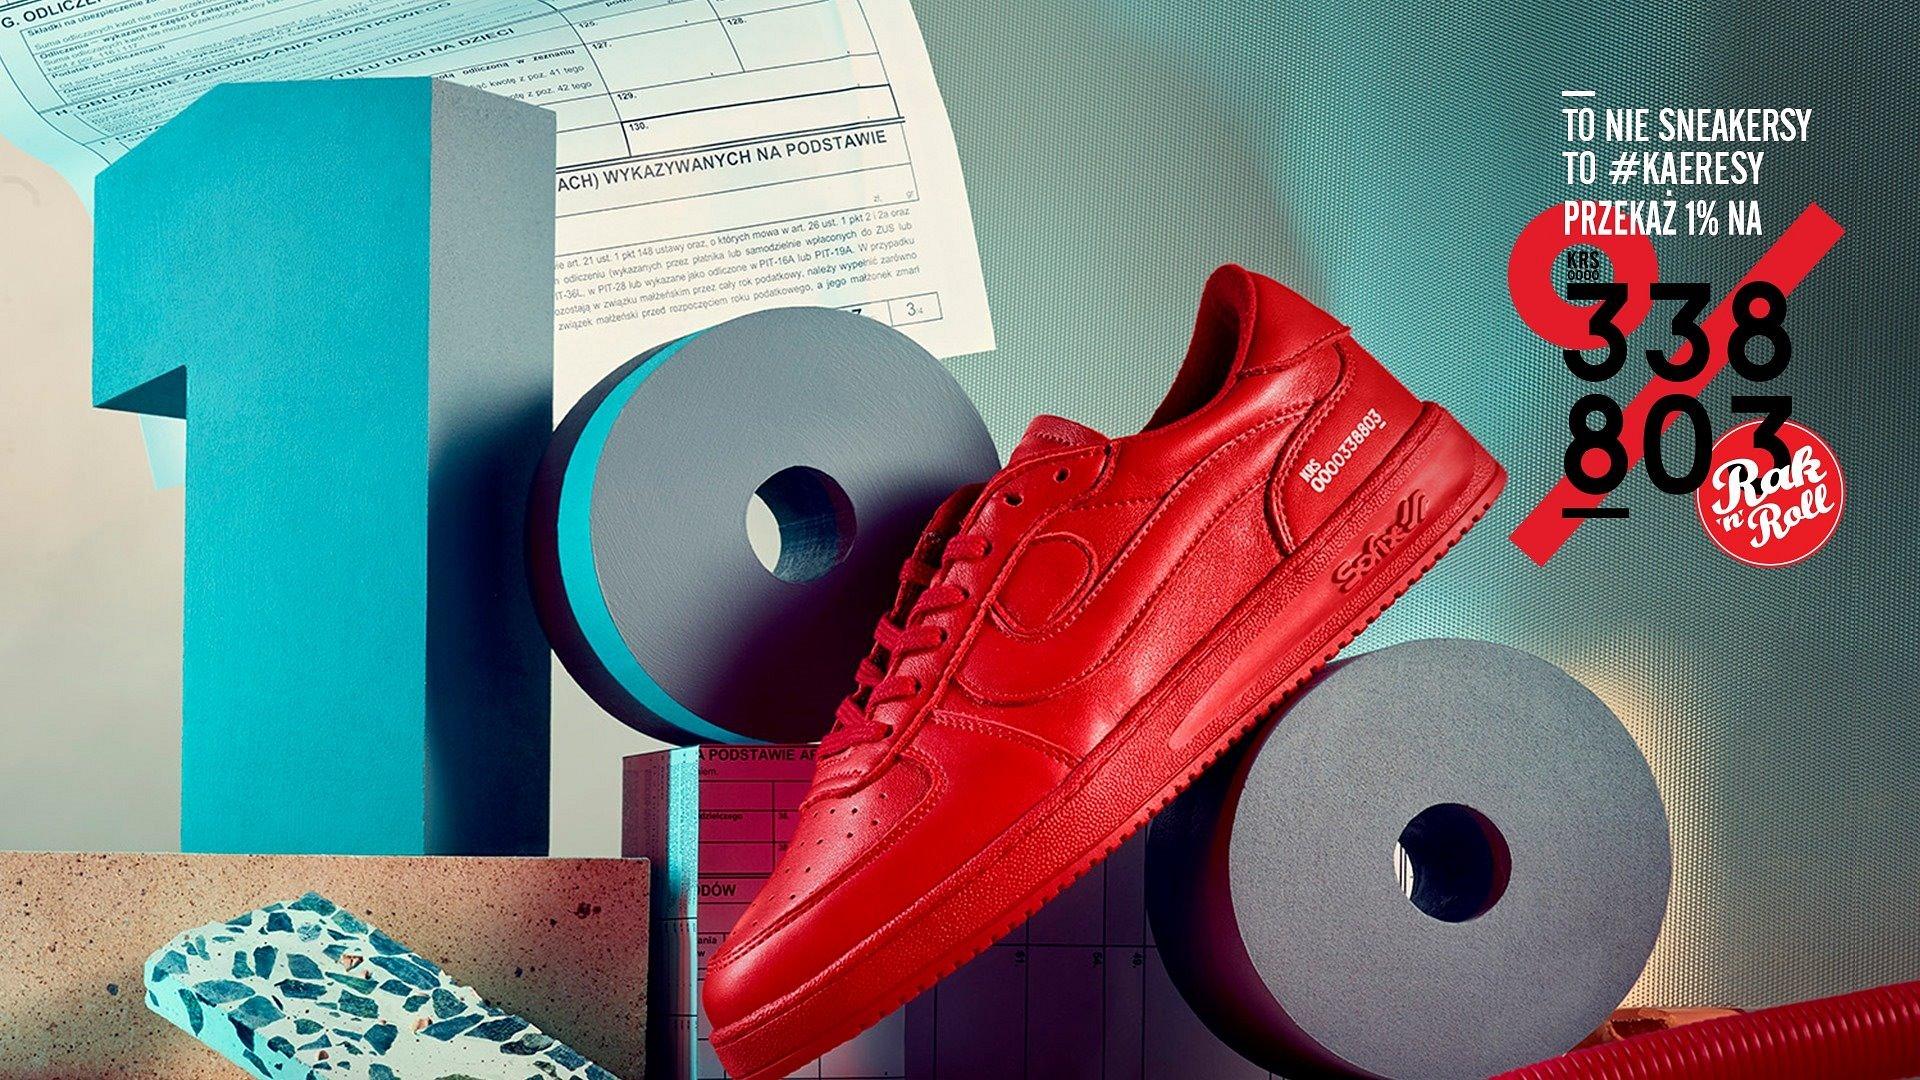 To nie sneakersy, to KAERESY - kolabo Sofix i Rak'n'Roll